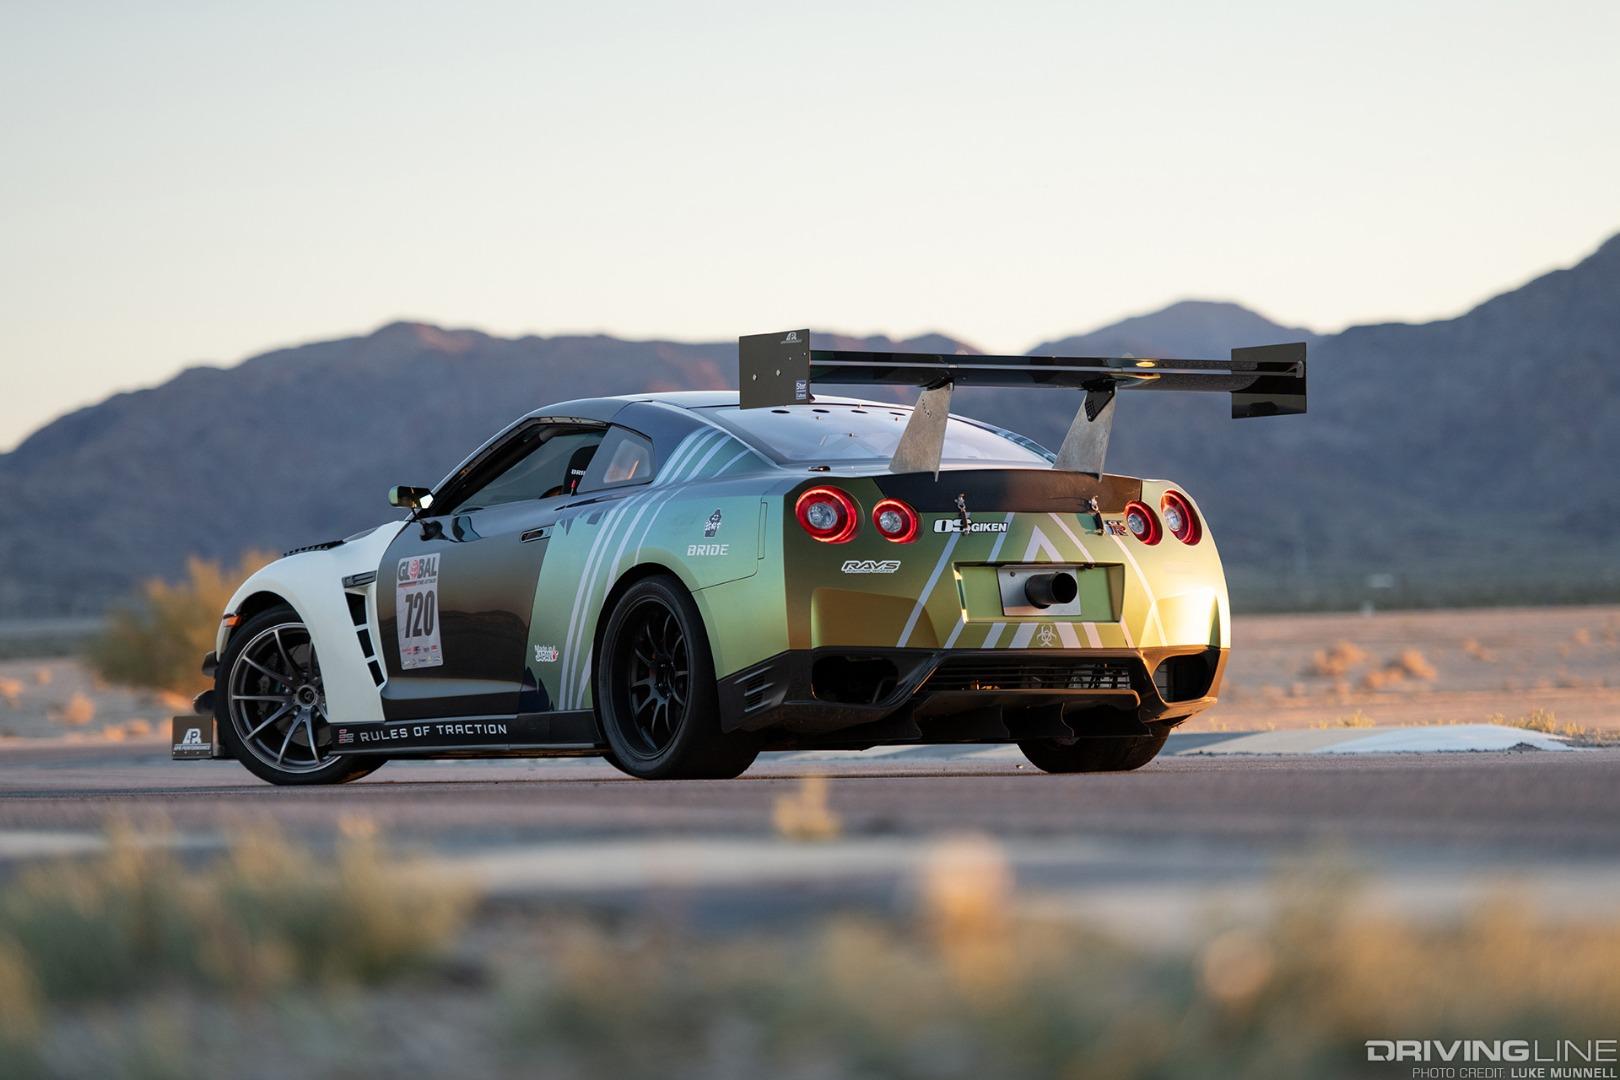 Saddling Godzilla: '15 Nissan GT-R Track Car